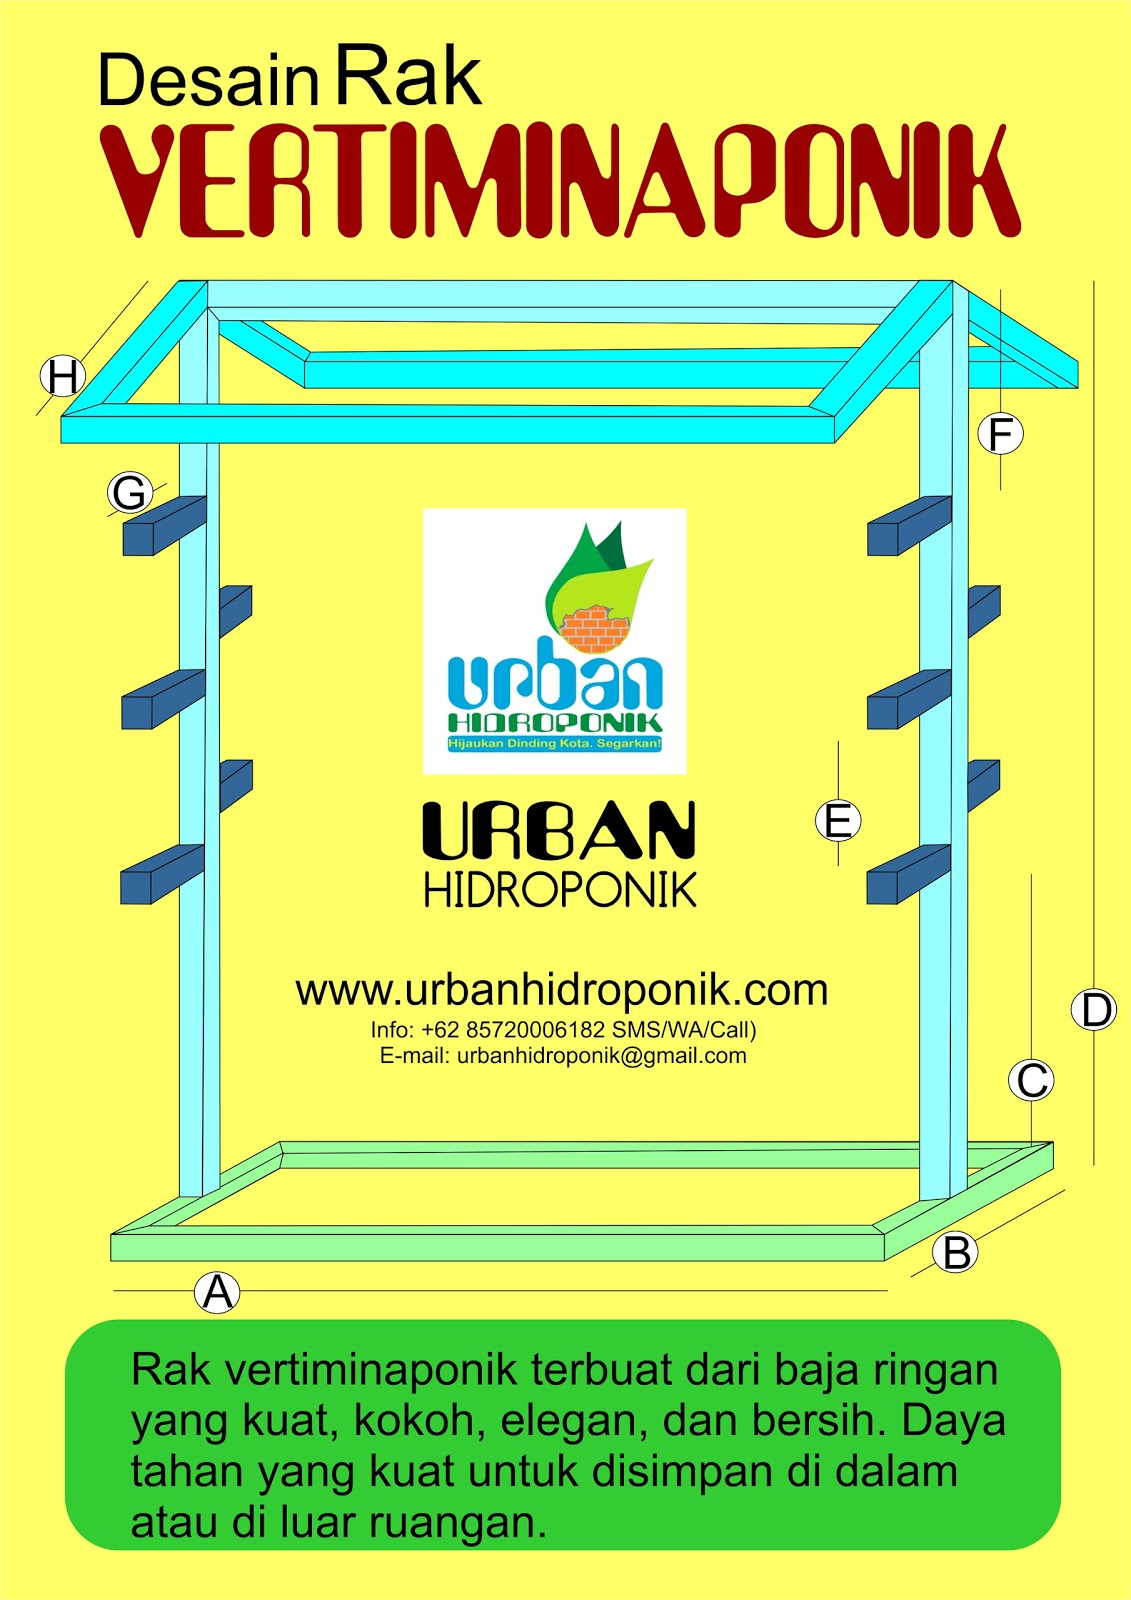 memilih gunting baja ringan kiat bahan rak hidroponik portable urban